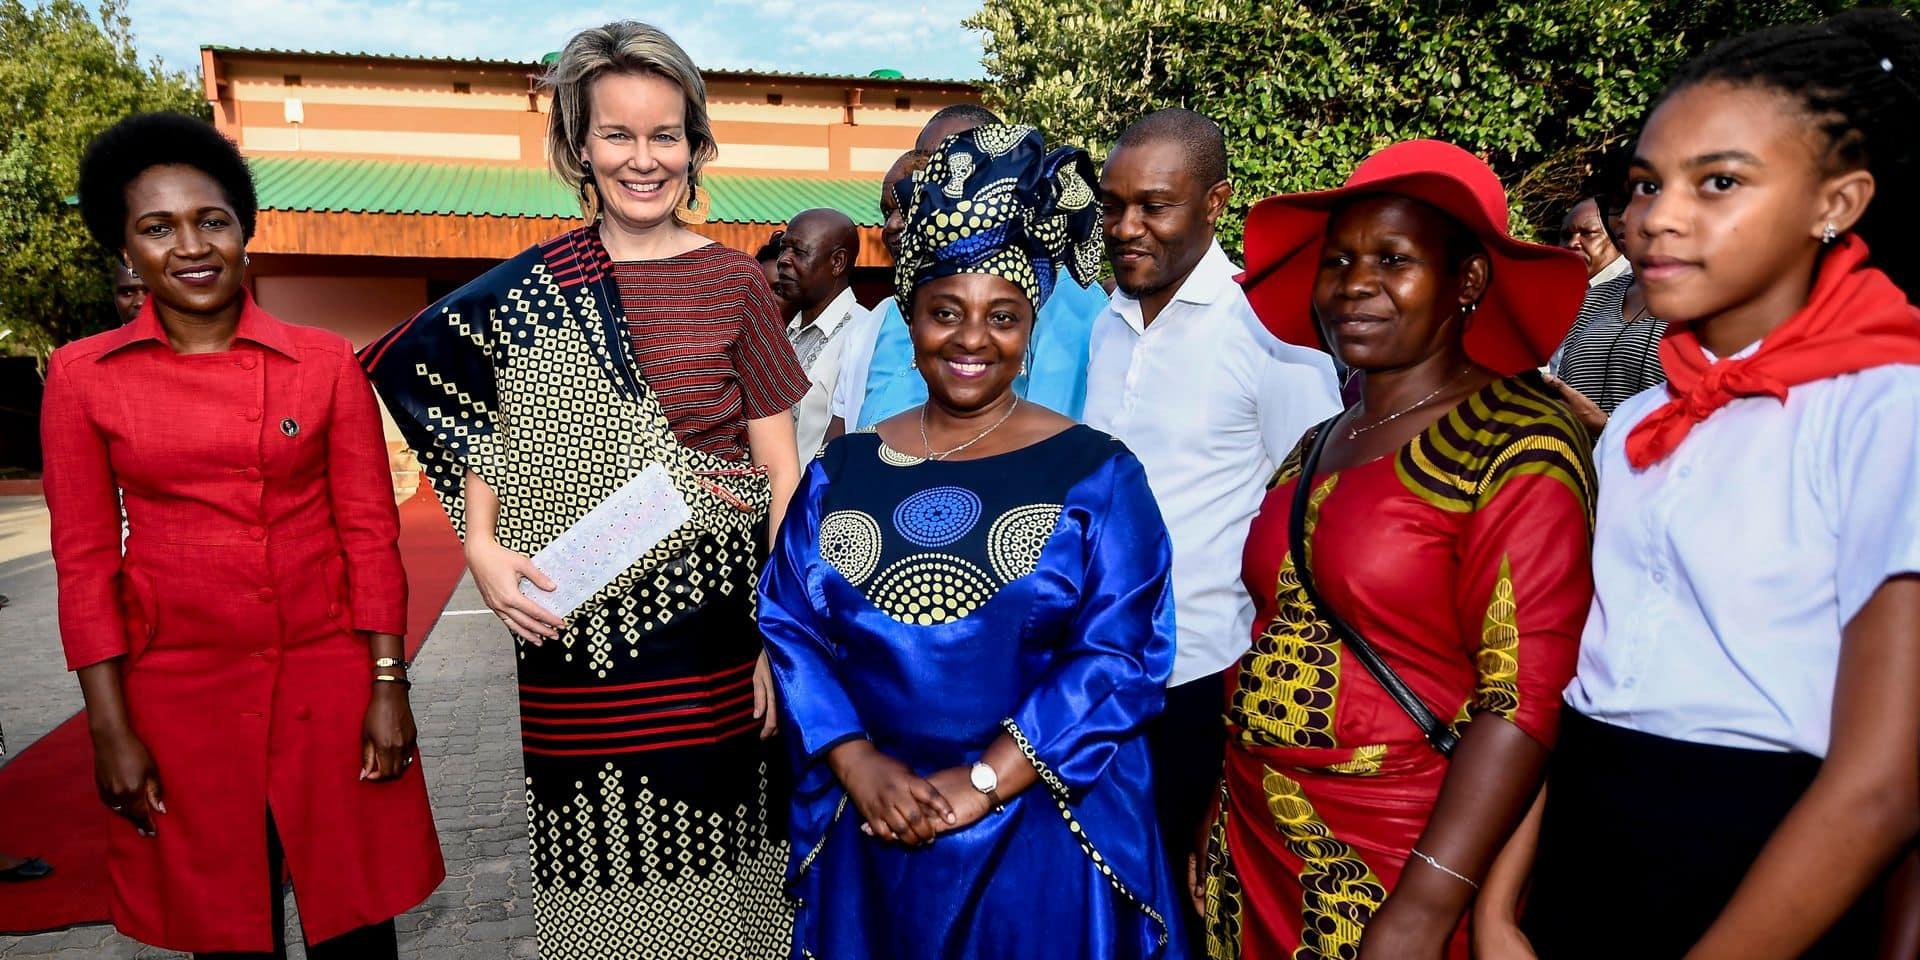 La reine Mathilde adopte le capulana, le pagne mozambicain